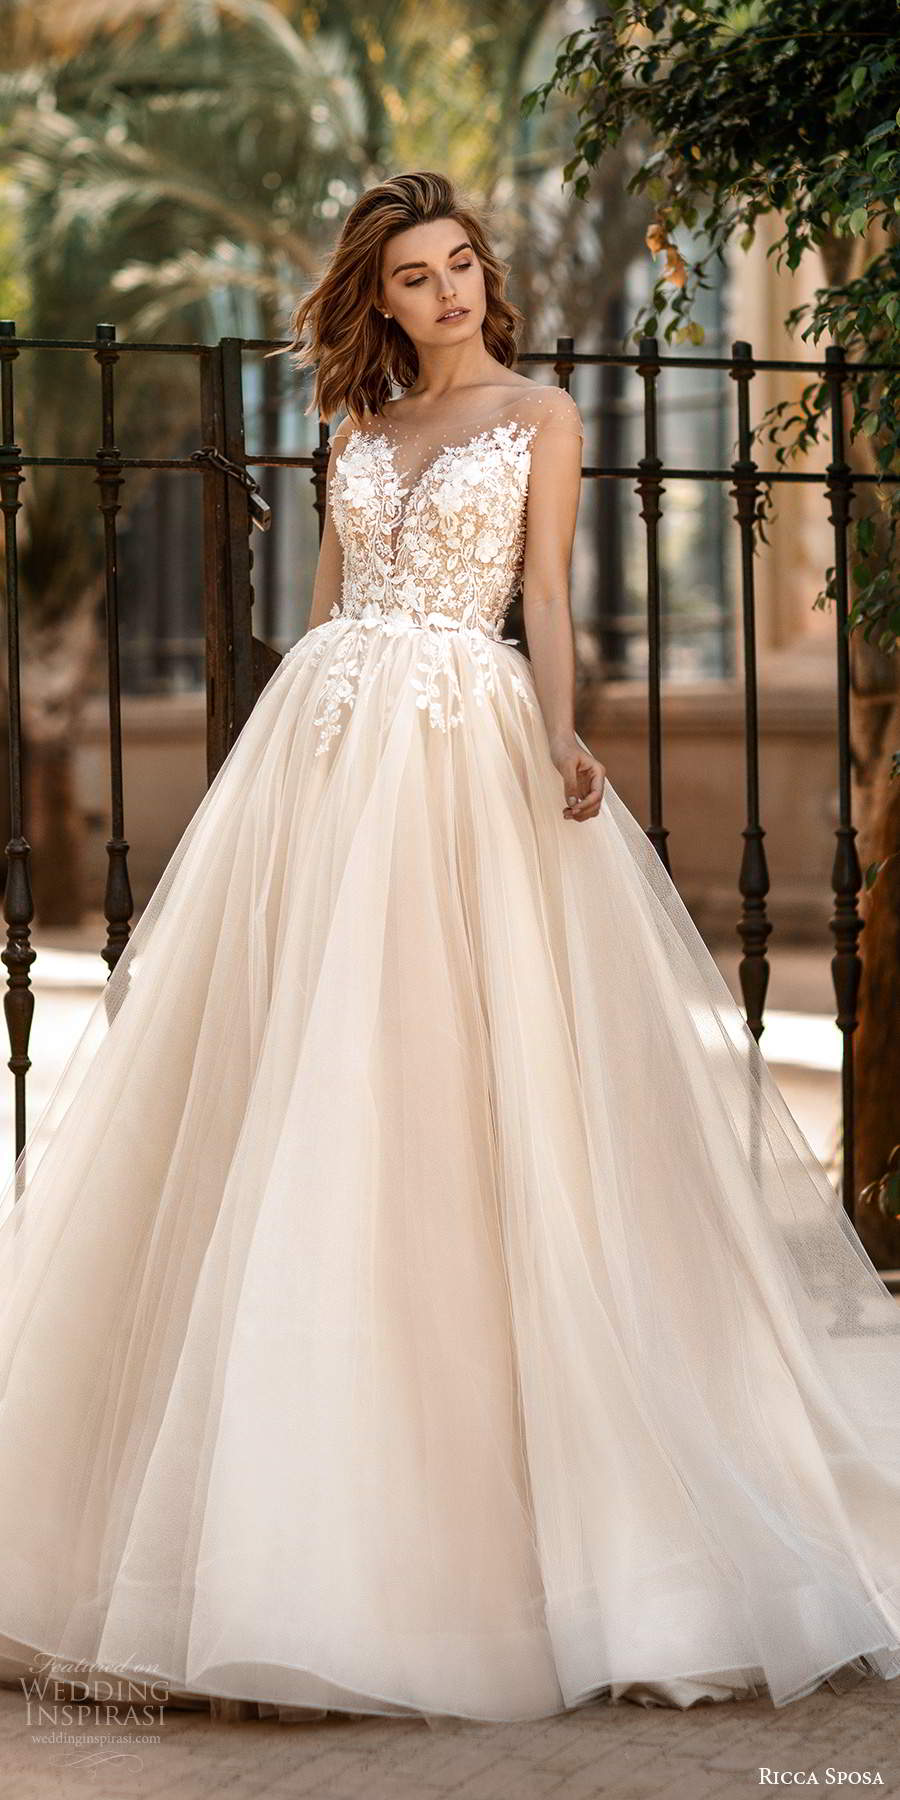 ricca sposa 2020 barcelona bridal illusion cap sleeves sheer bateau sweetheart neckline heavily embellished bodice ball gown wedding dress sheer back chapel train (14) mv